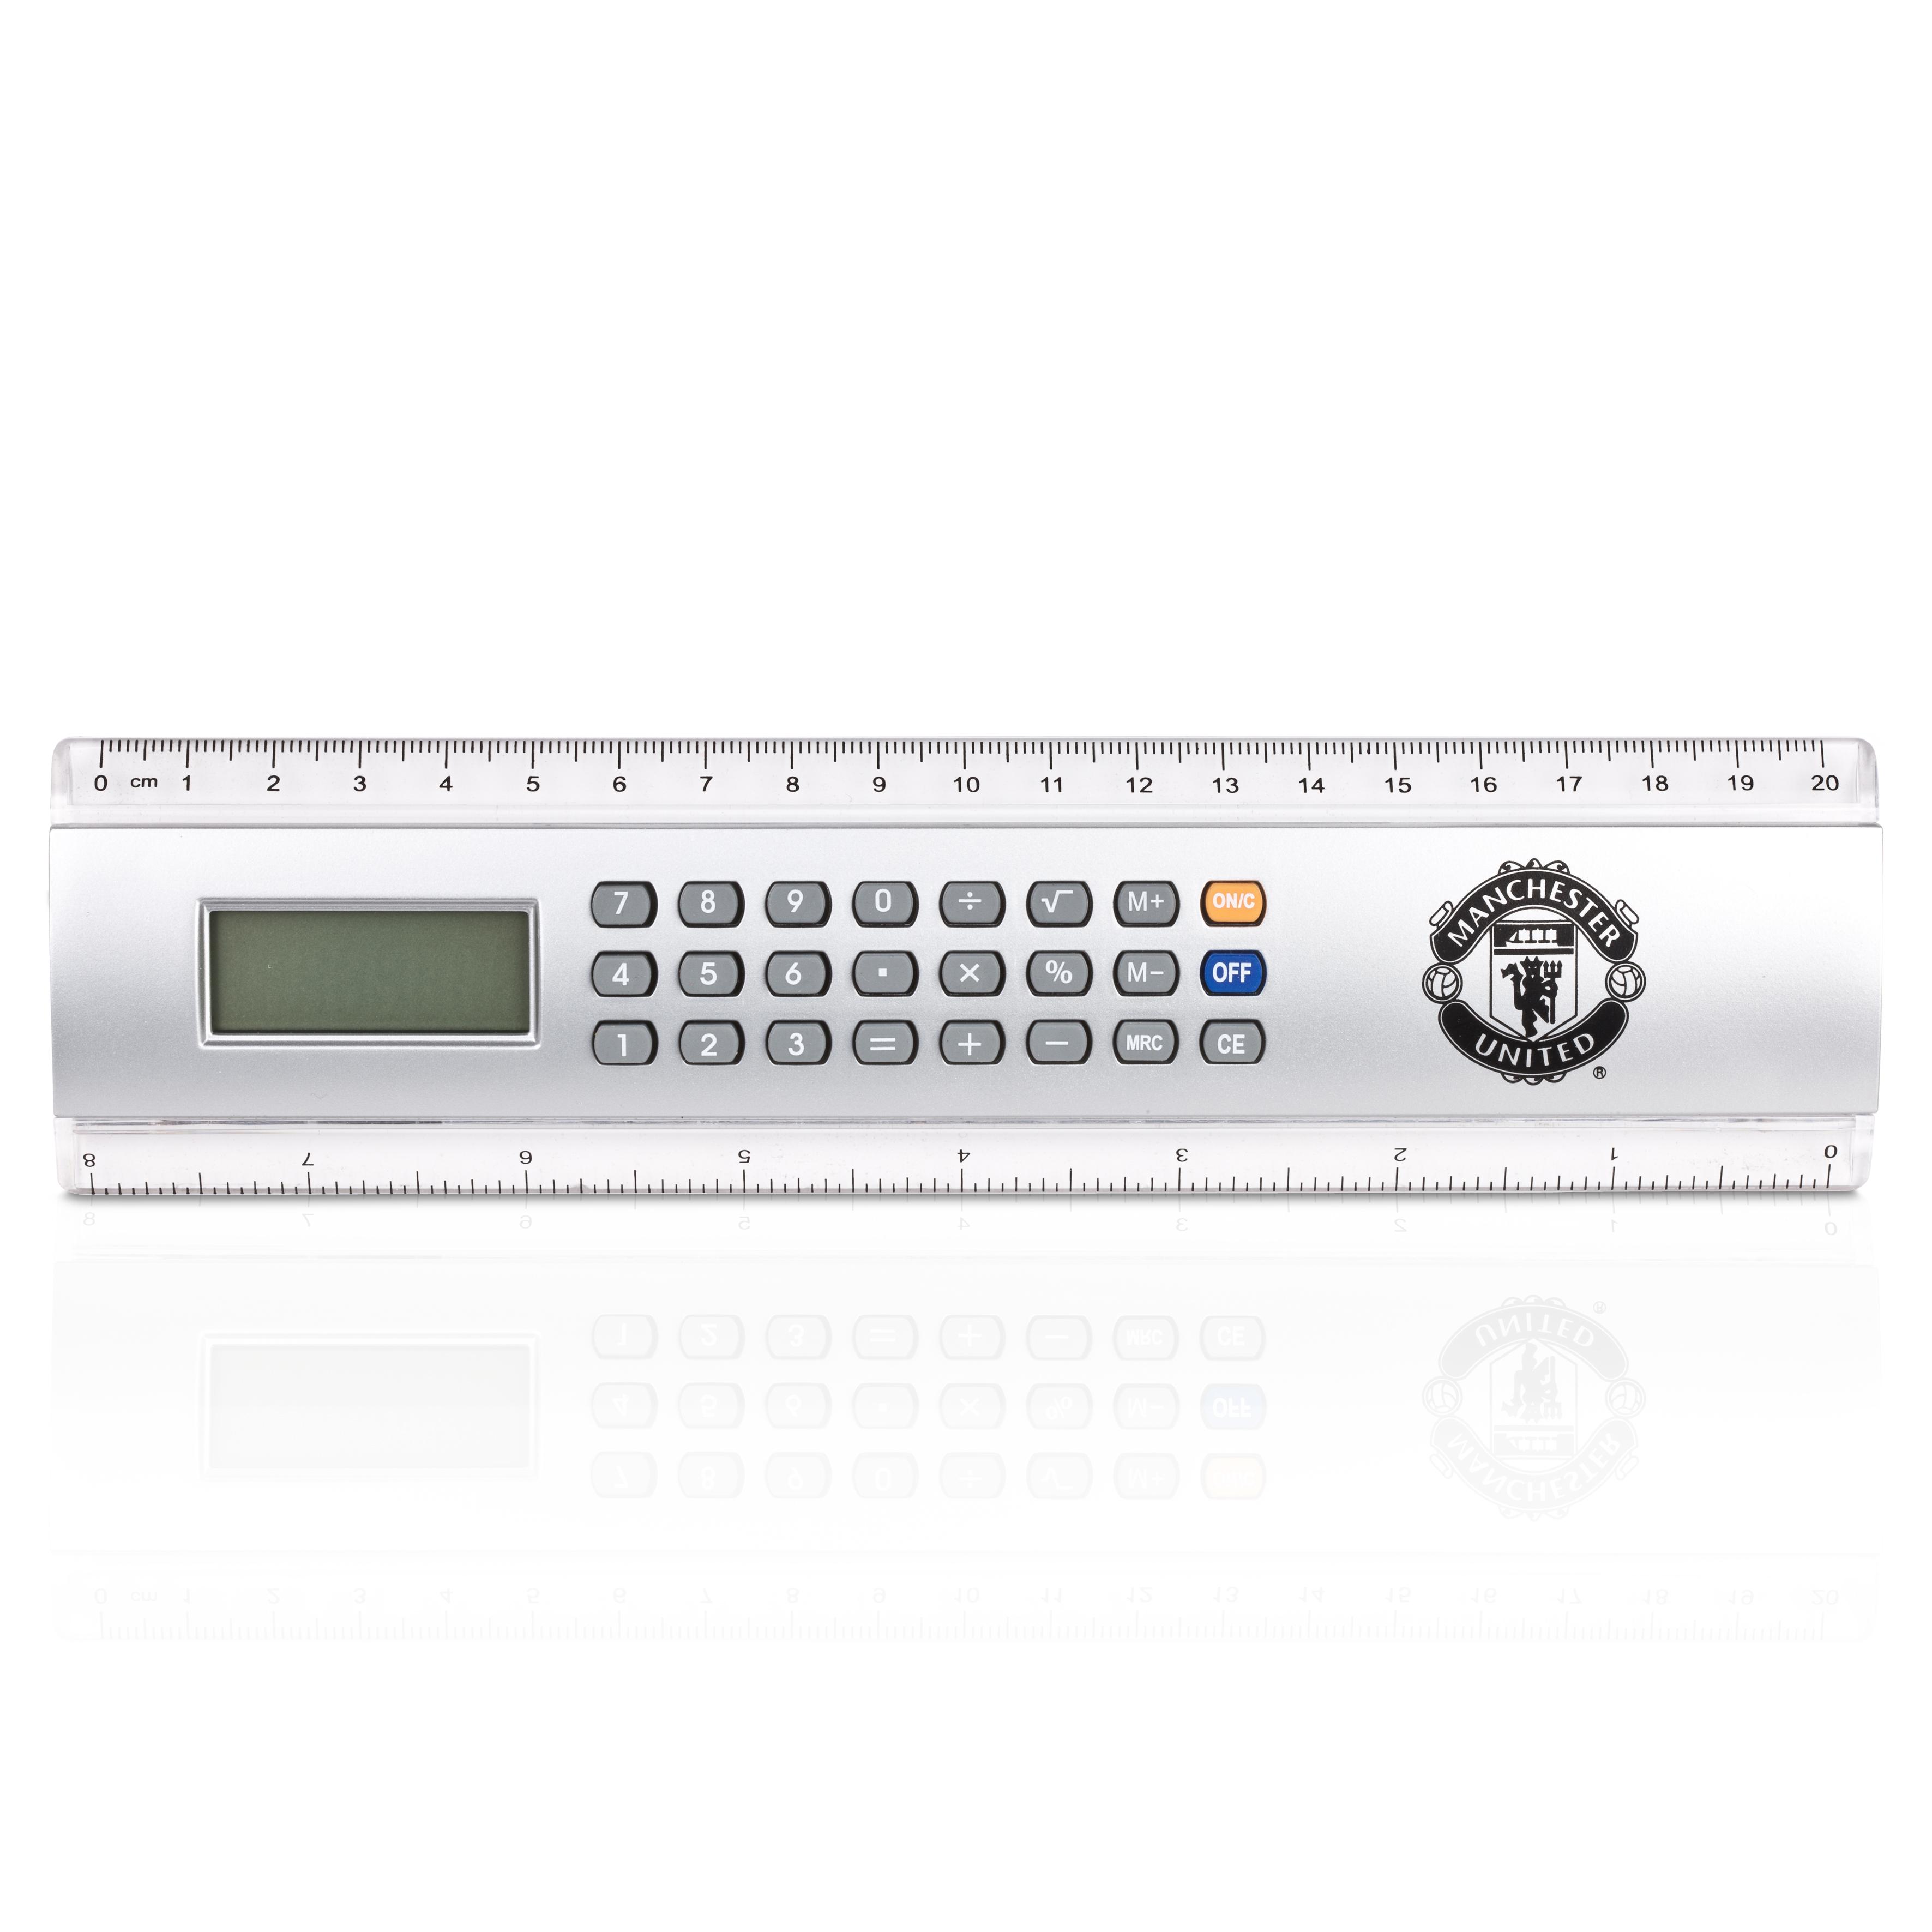 Manchester United Calculator Ruler